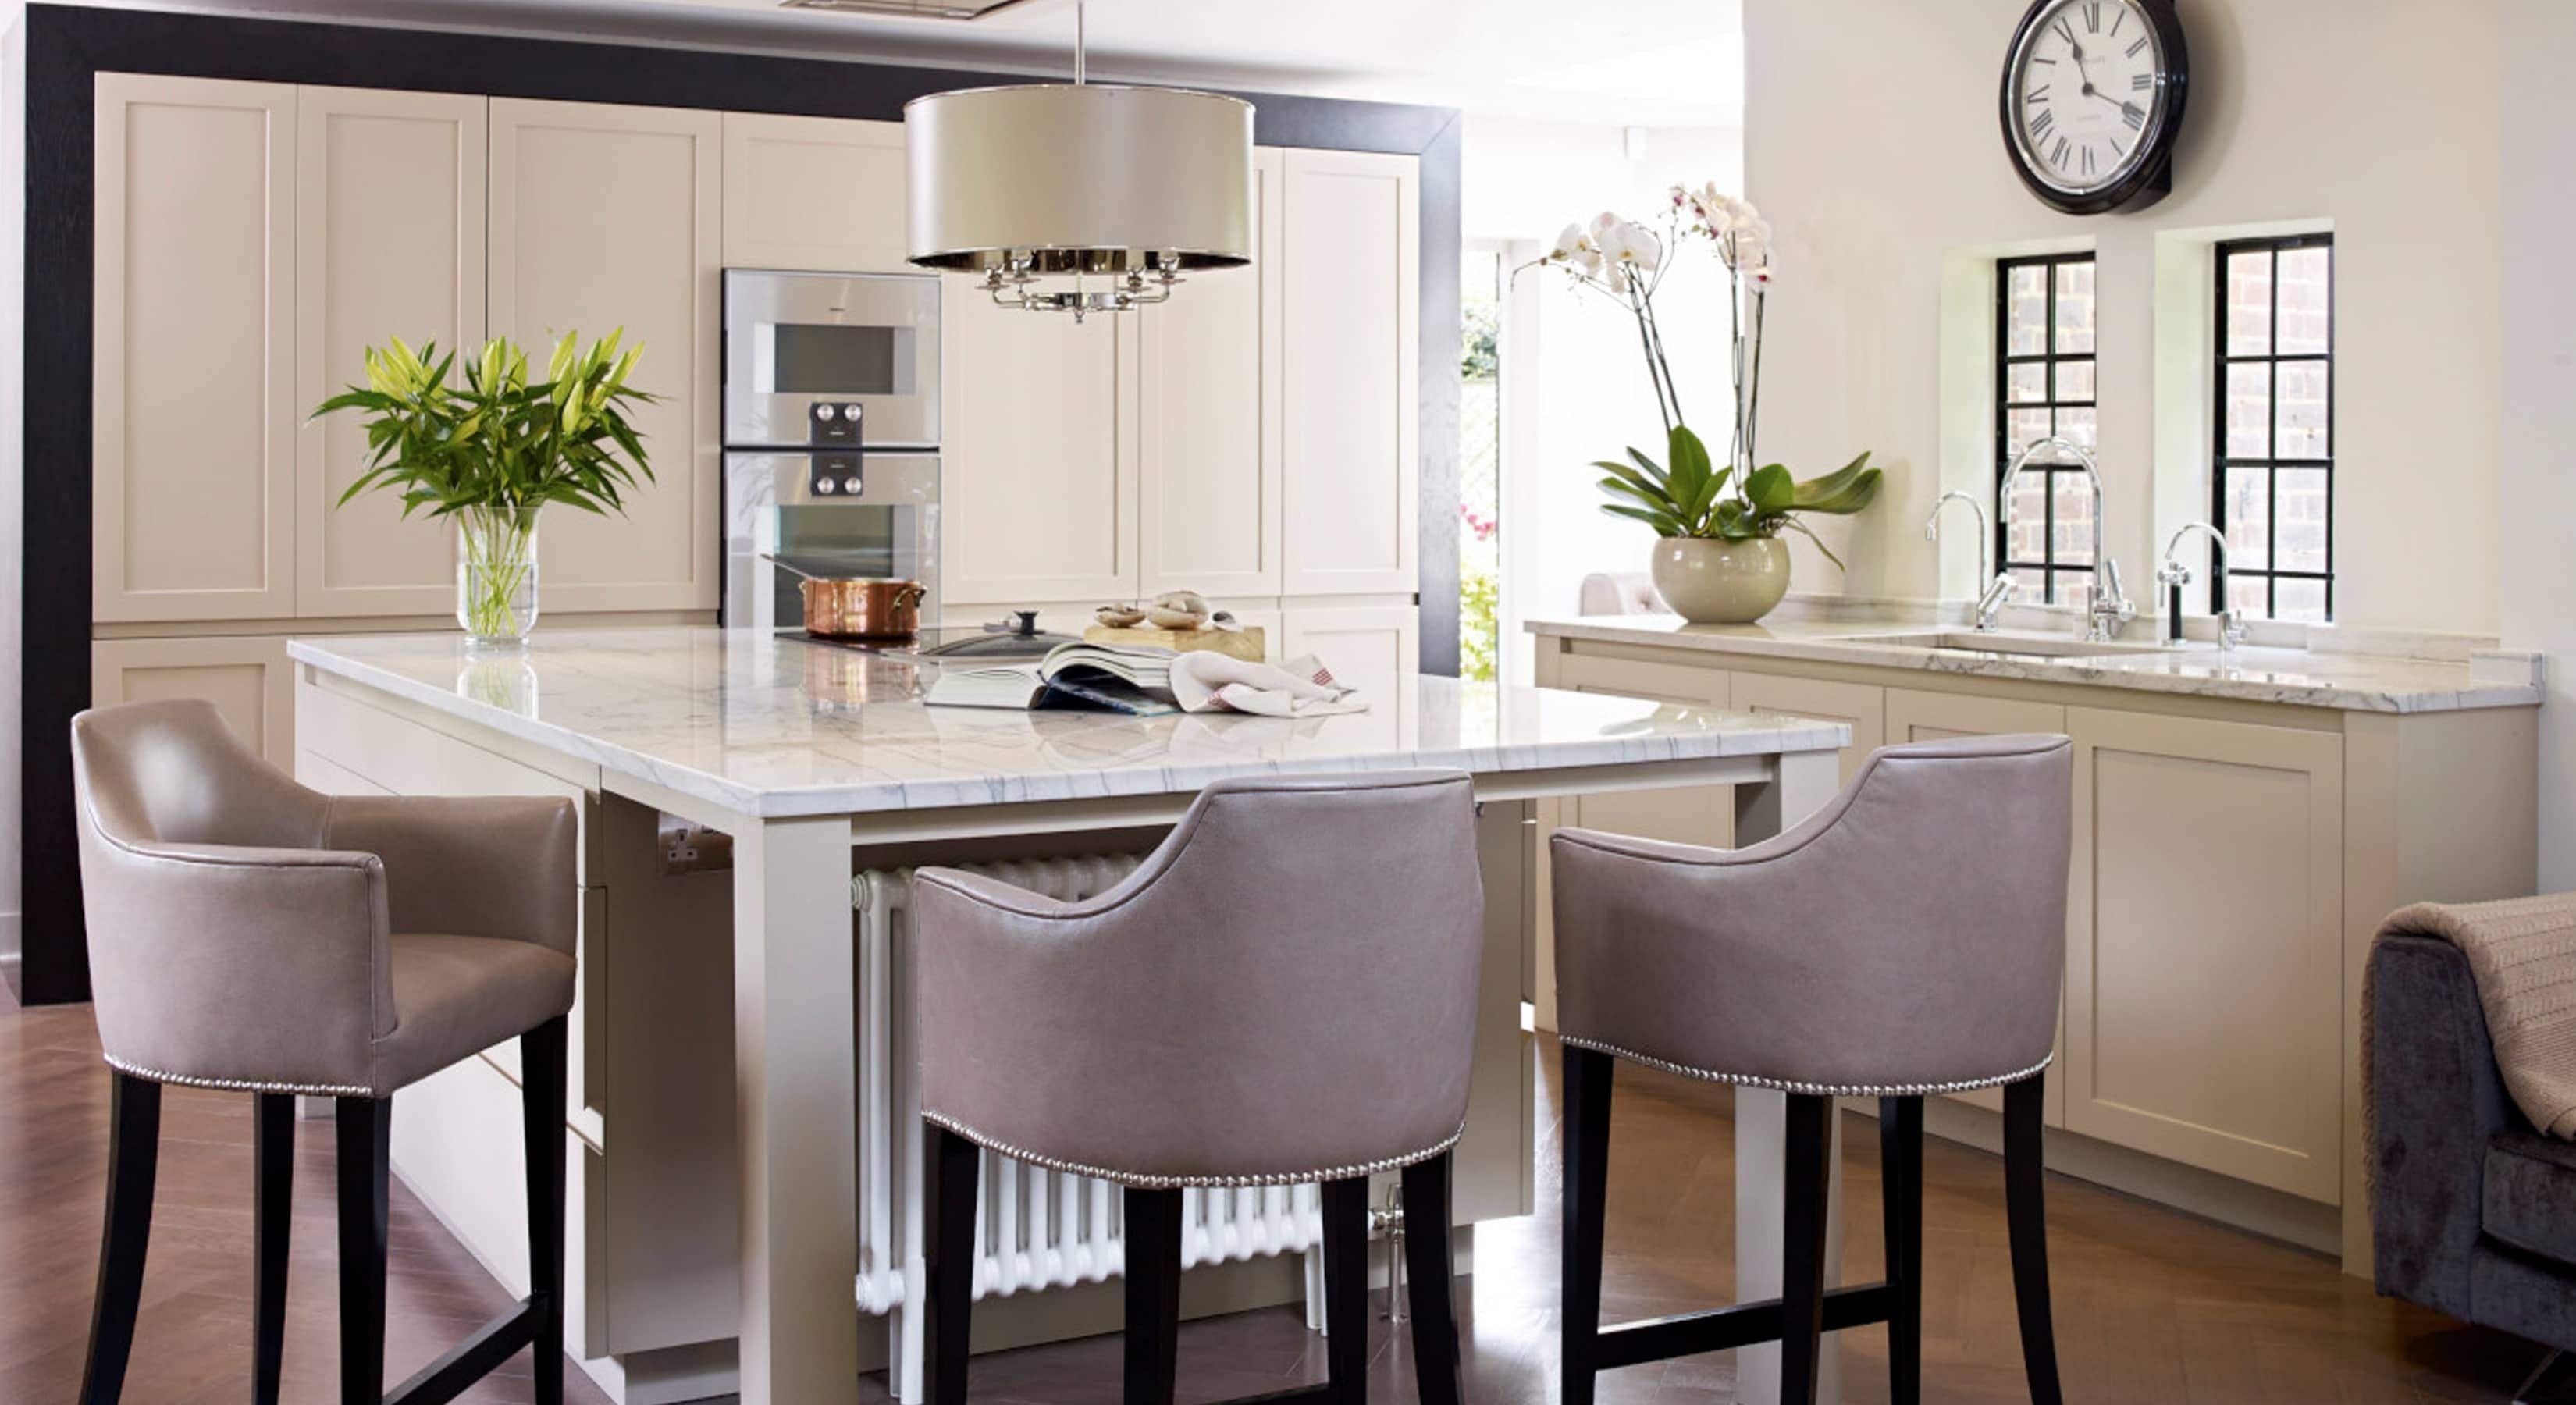 Shaw kitchen extension concept